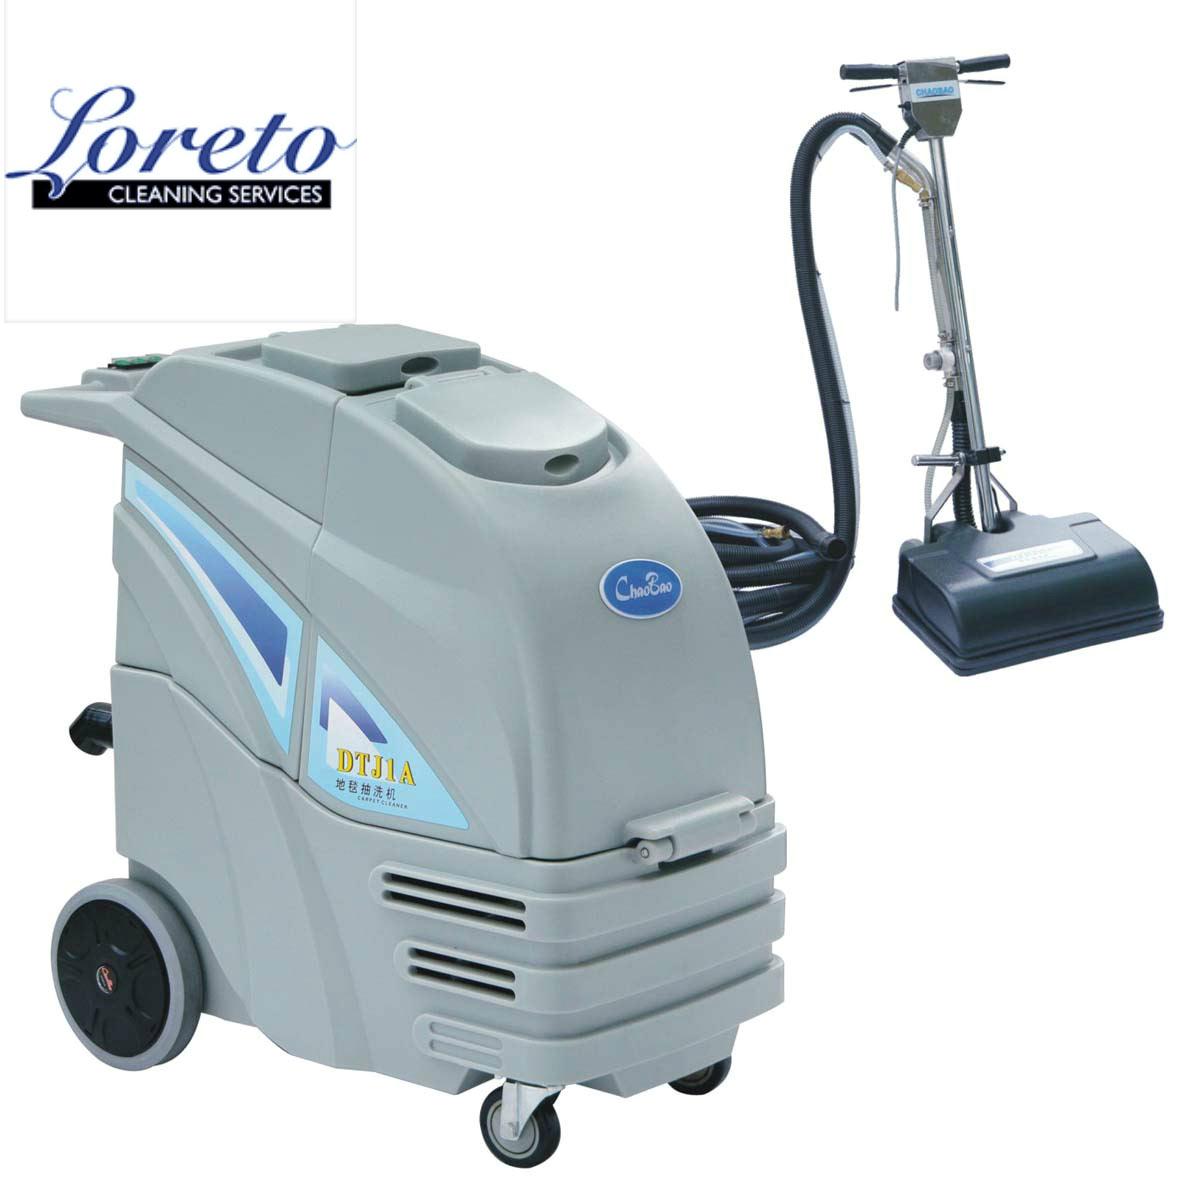 Carpet Cleaning Machine Rental